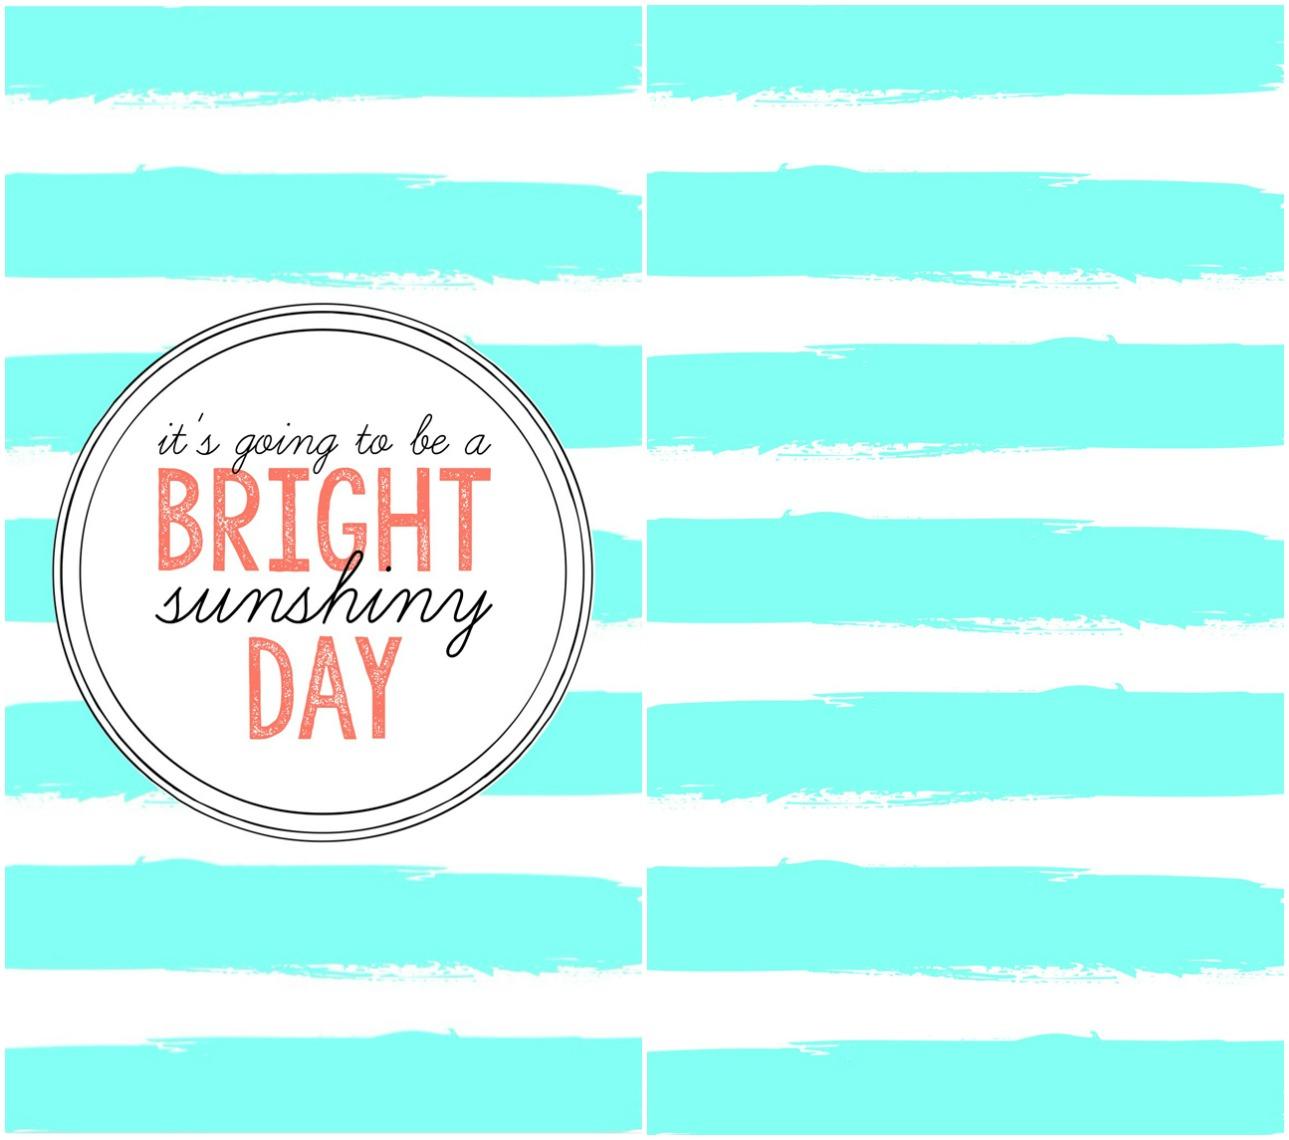 Beautiful Wallpaper Home Screen Bright - Bright-Sunshiny-Day-Wallpaper  Snapshot_3610070.jpg